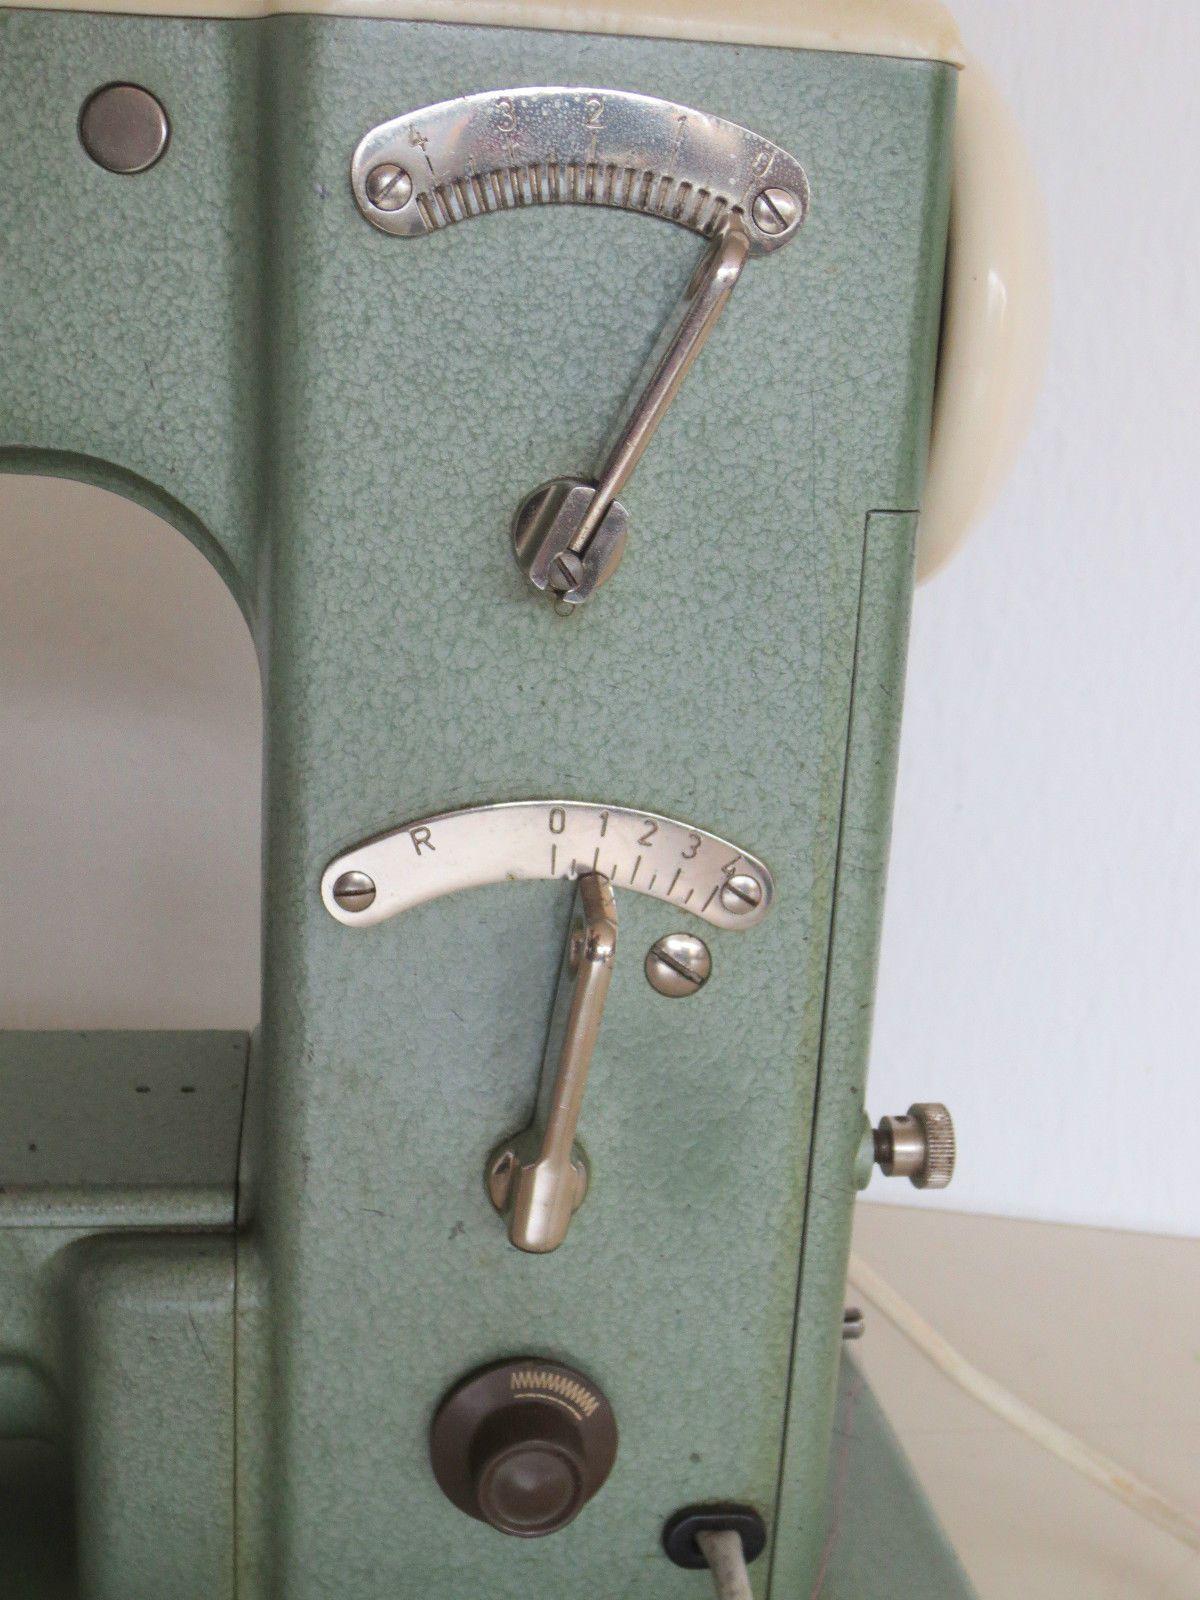 Nähmaschine Gritzner Automatic FZ Profinähmaschine  (sewing machine)